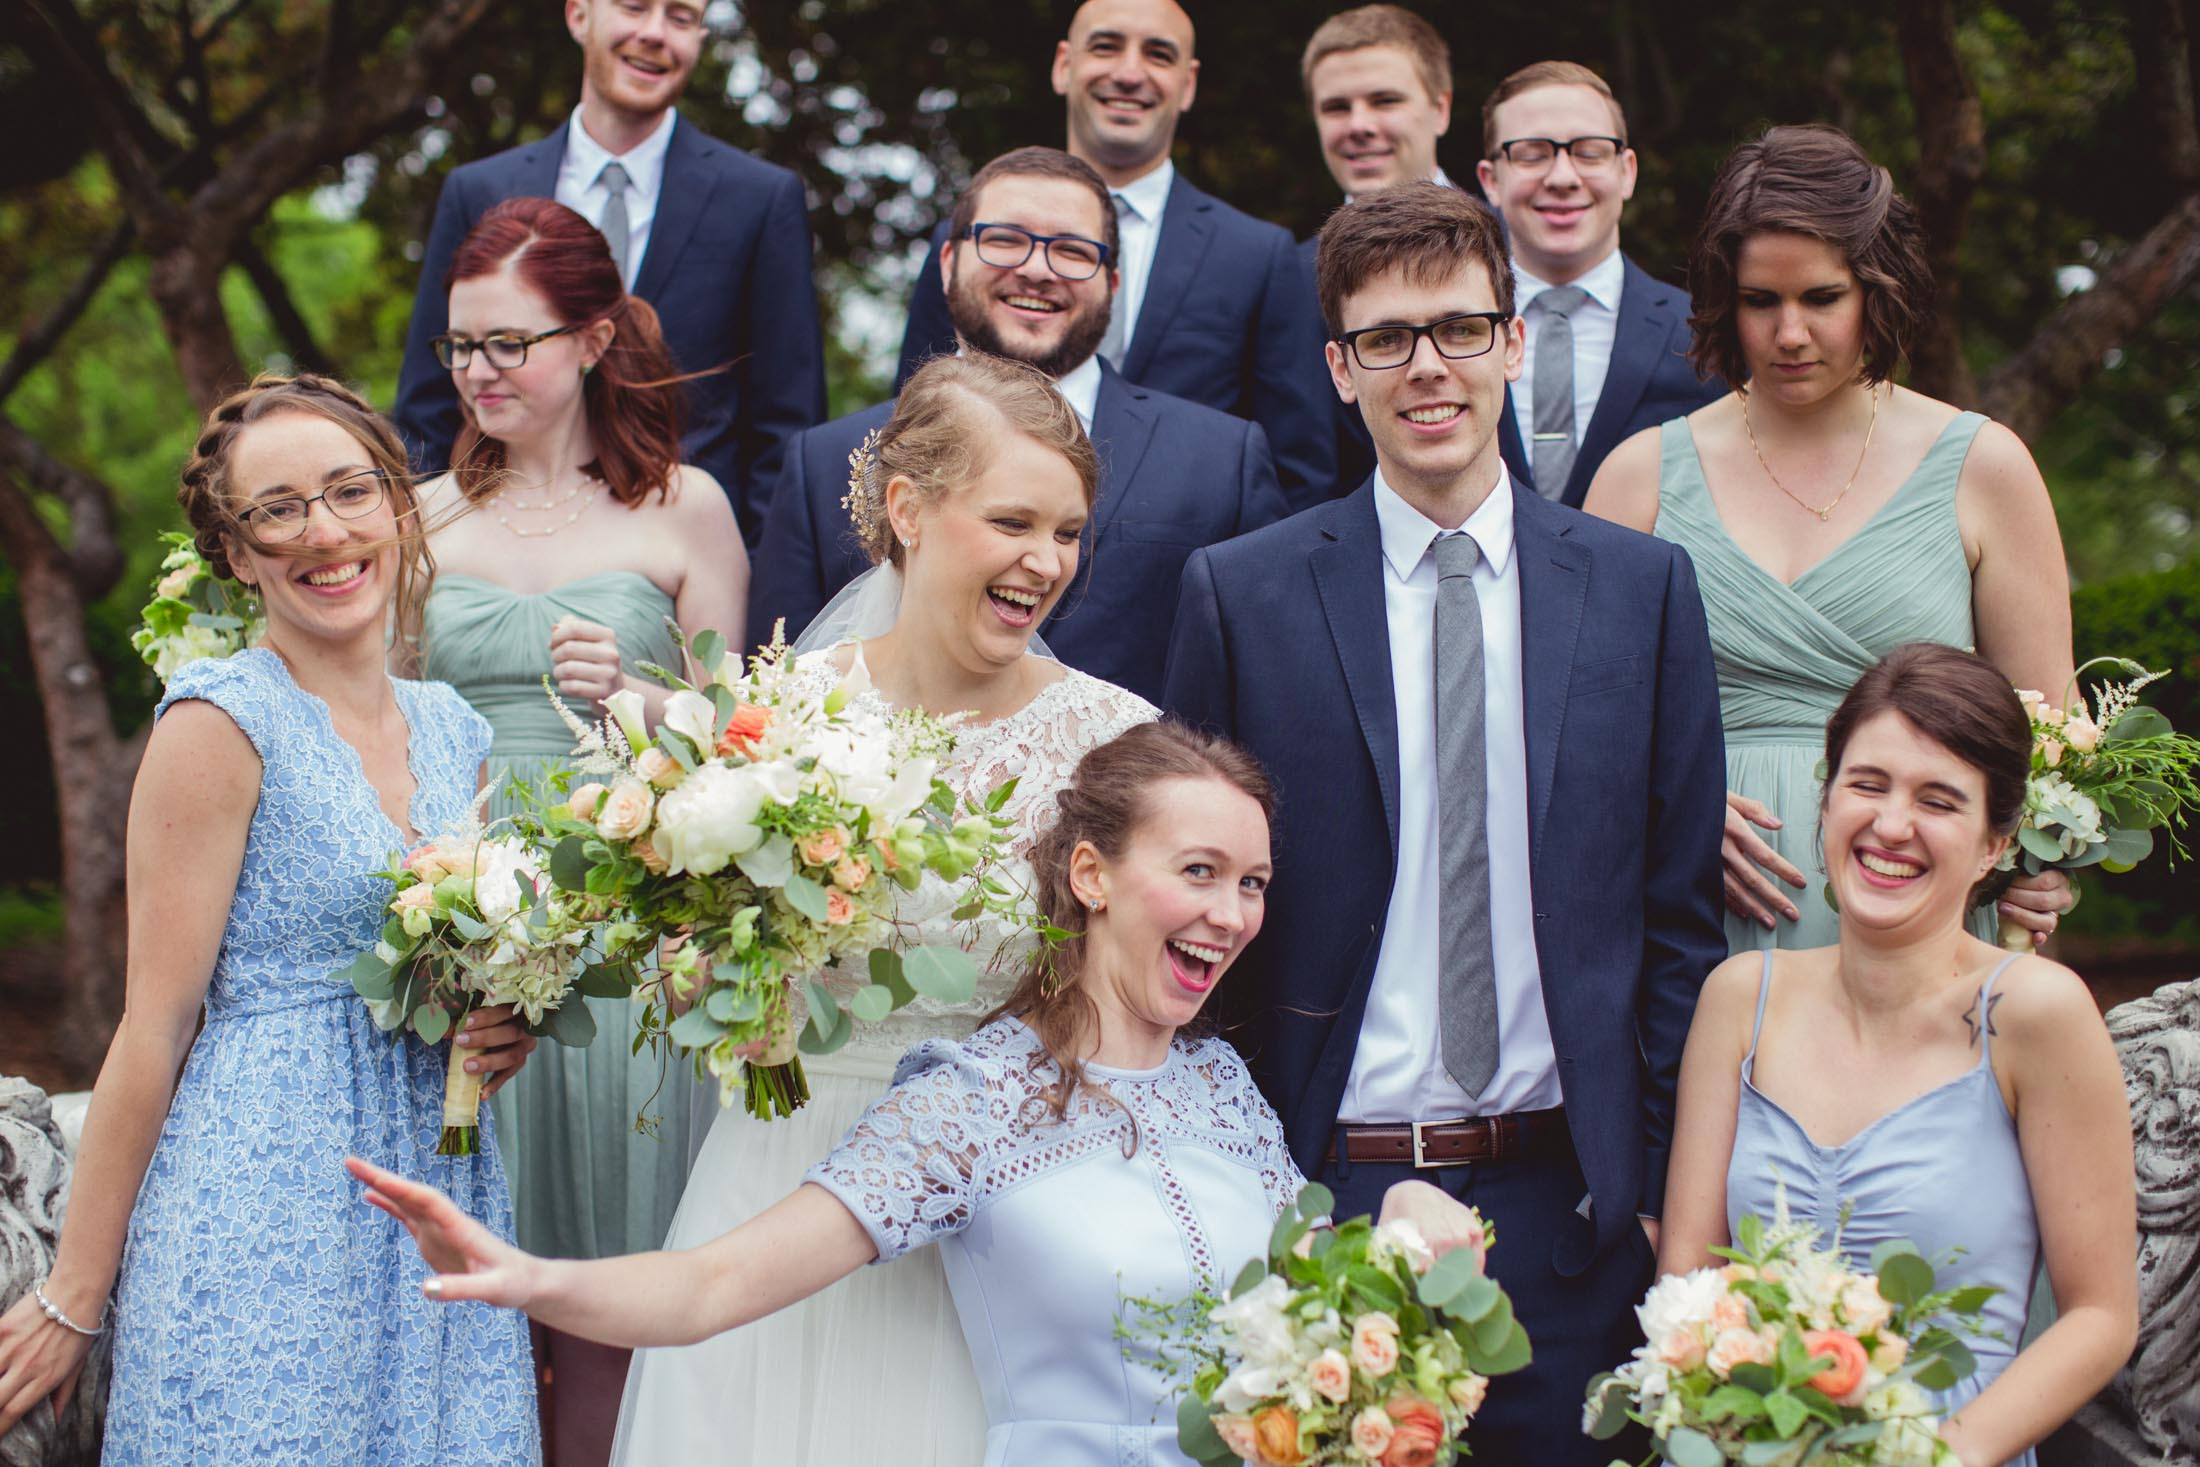 Elks-Wedding-Gloucester-12.jpg